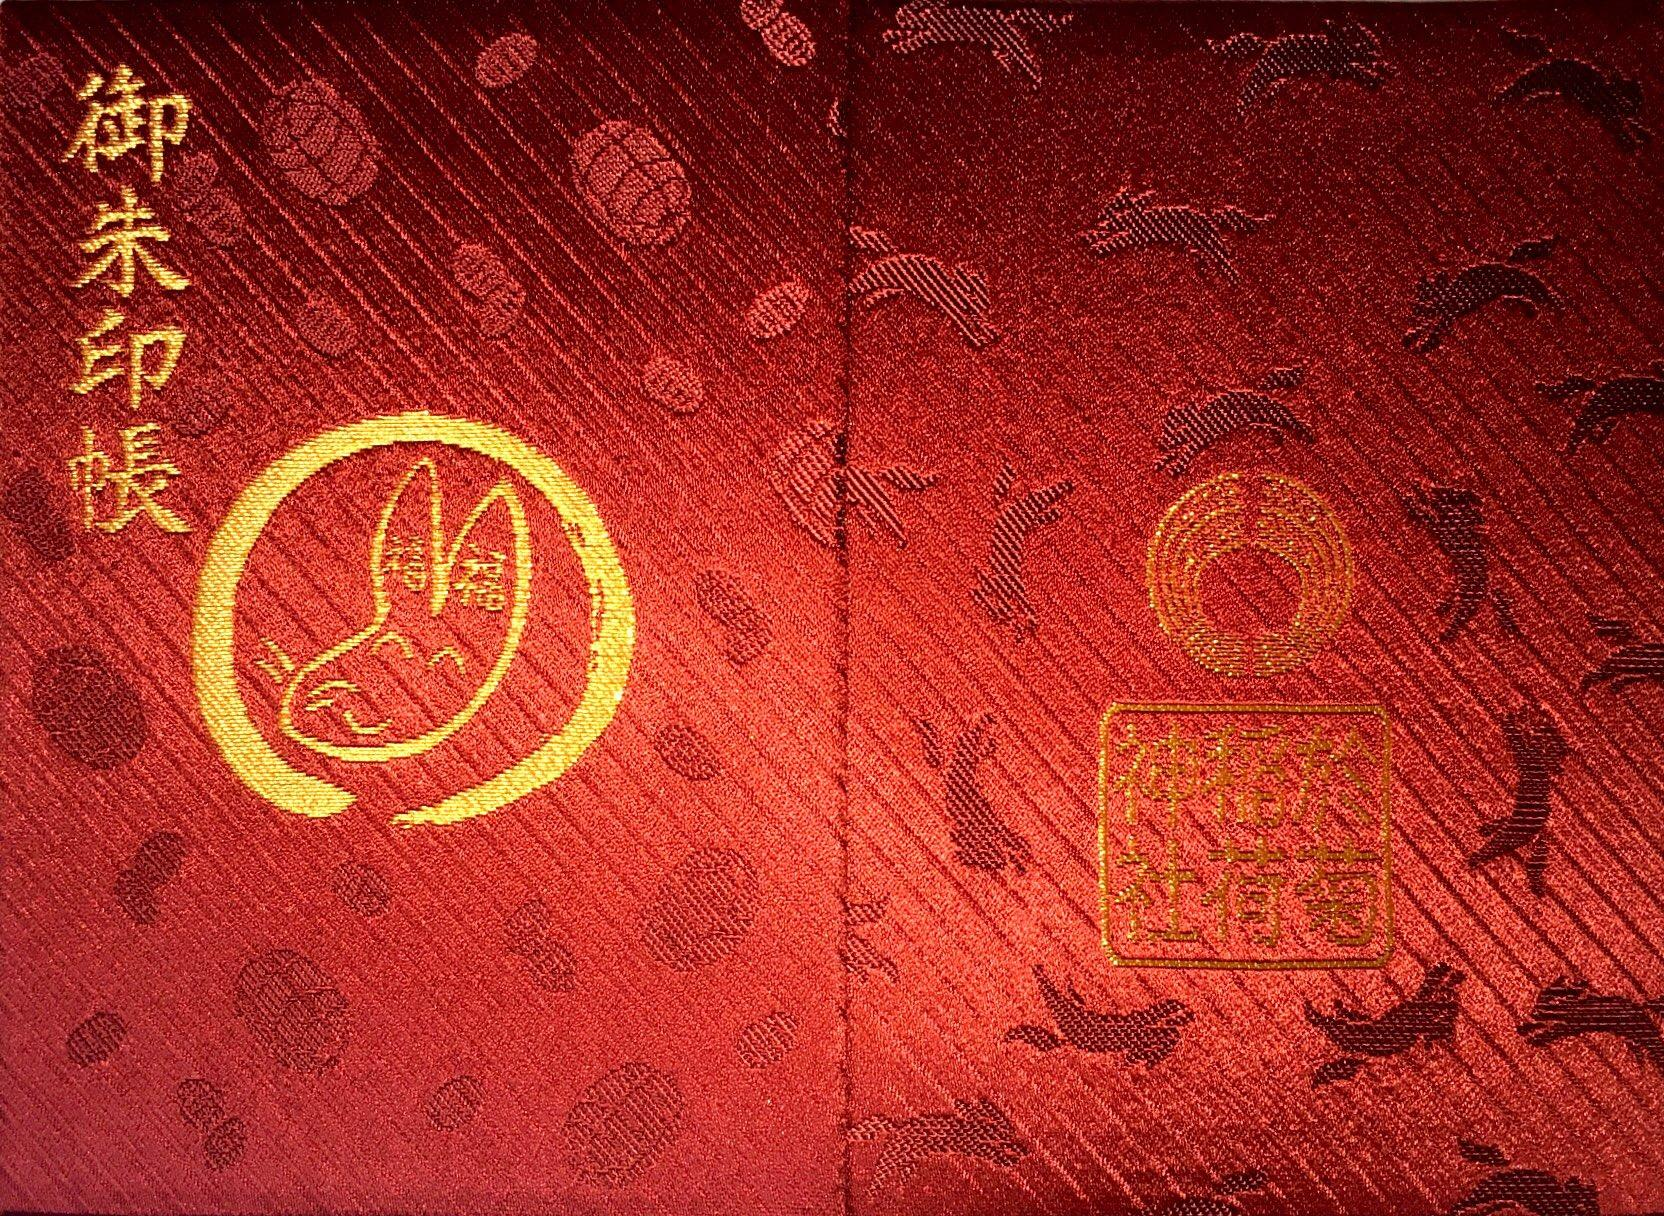 於菊稲荷神社の御朱印帳